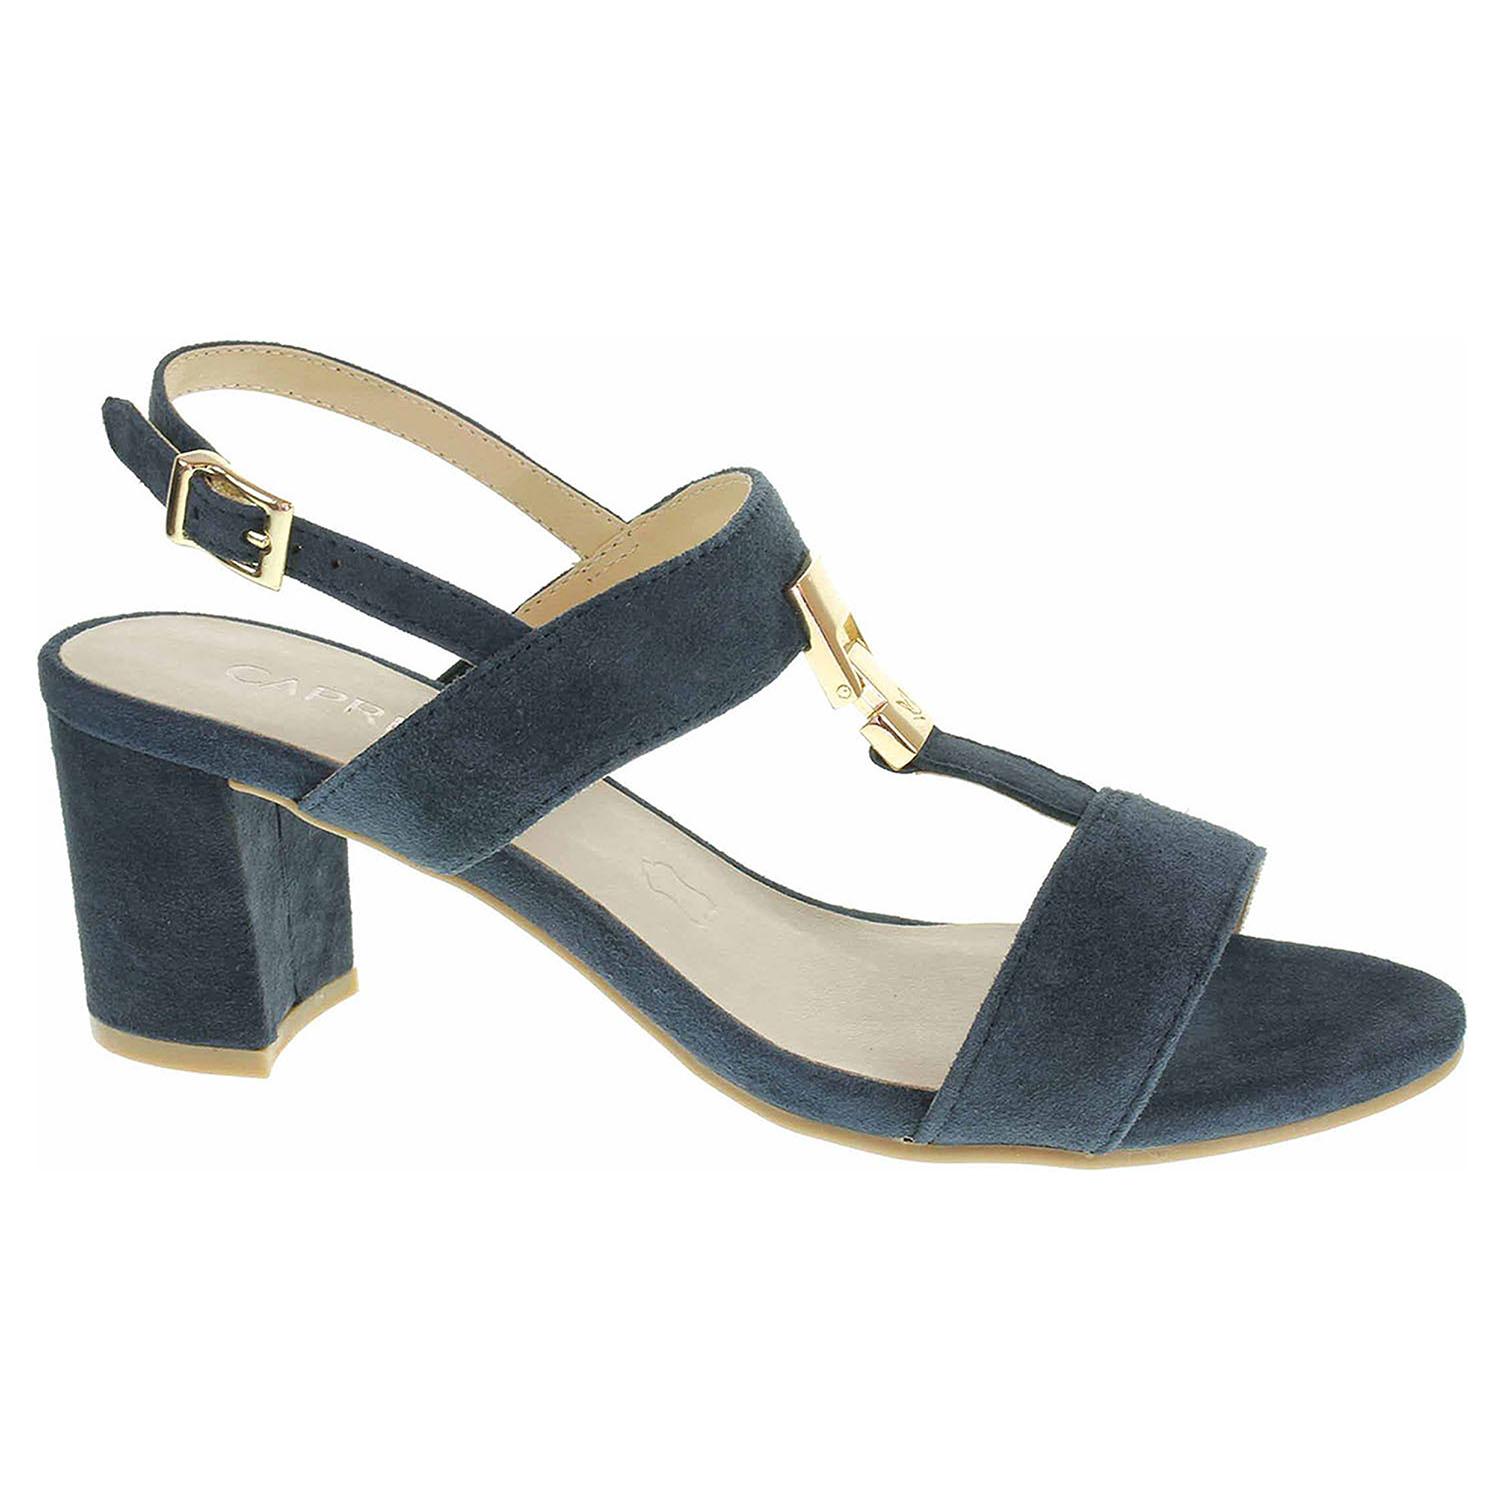 9/9-28303/22 857 ocean suede módní dámské sandály, semišové CAPRICE